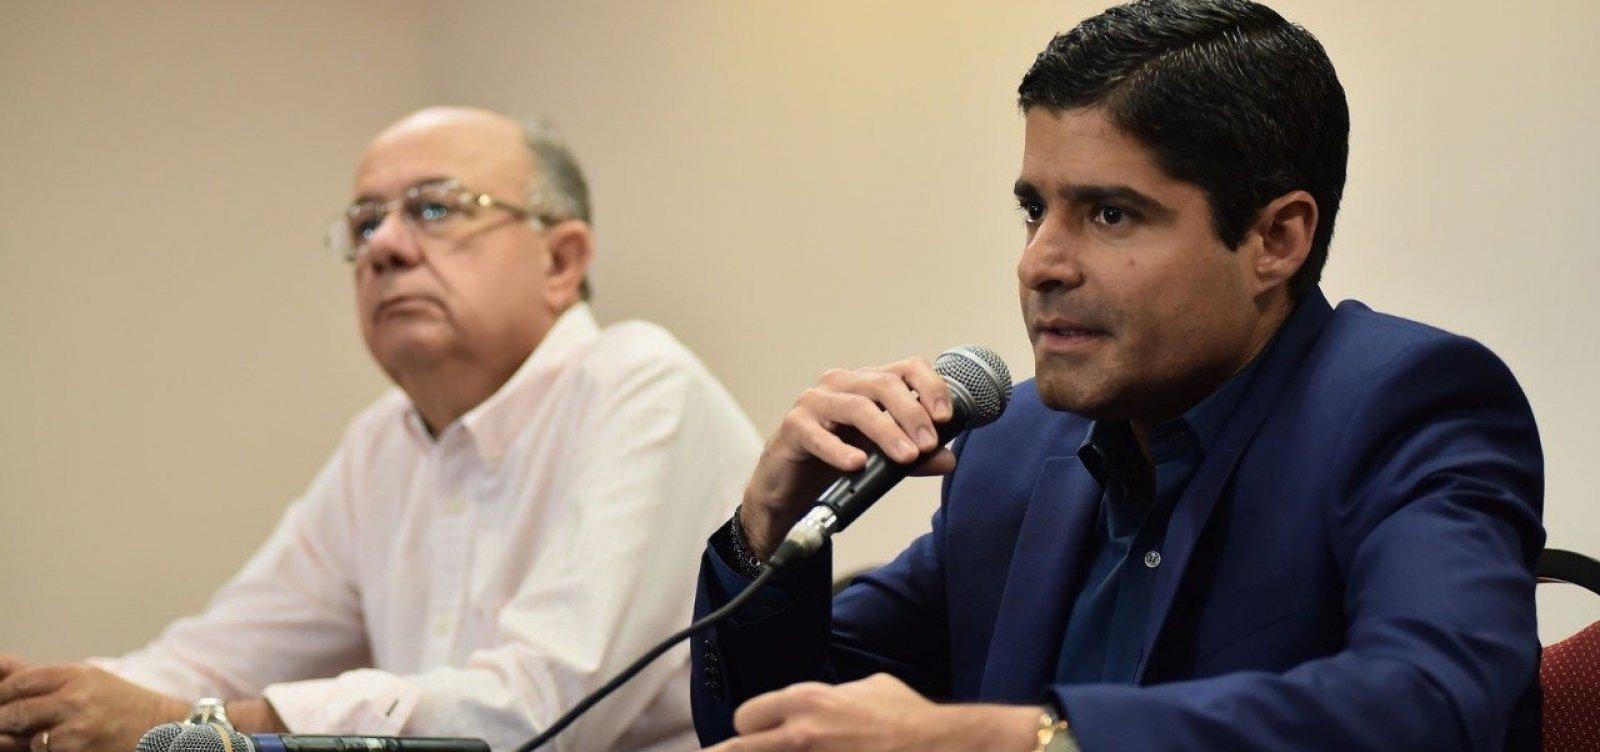 [ACM Neto declara apoio a Jair Bolsonaro]